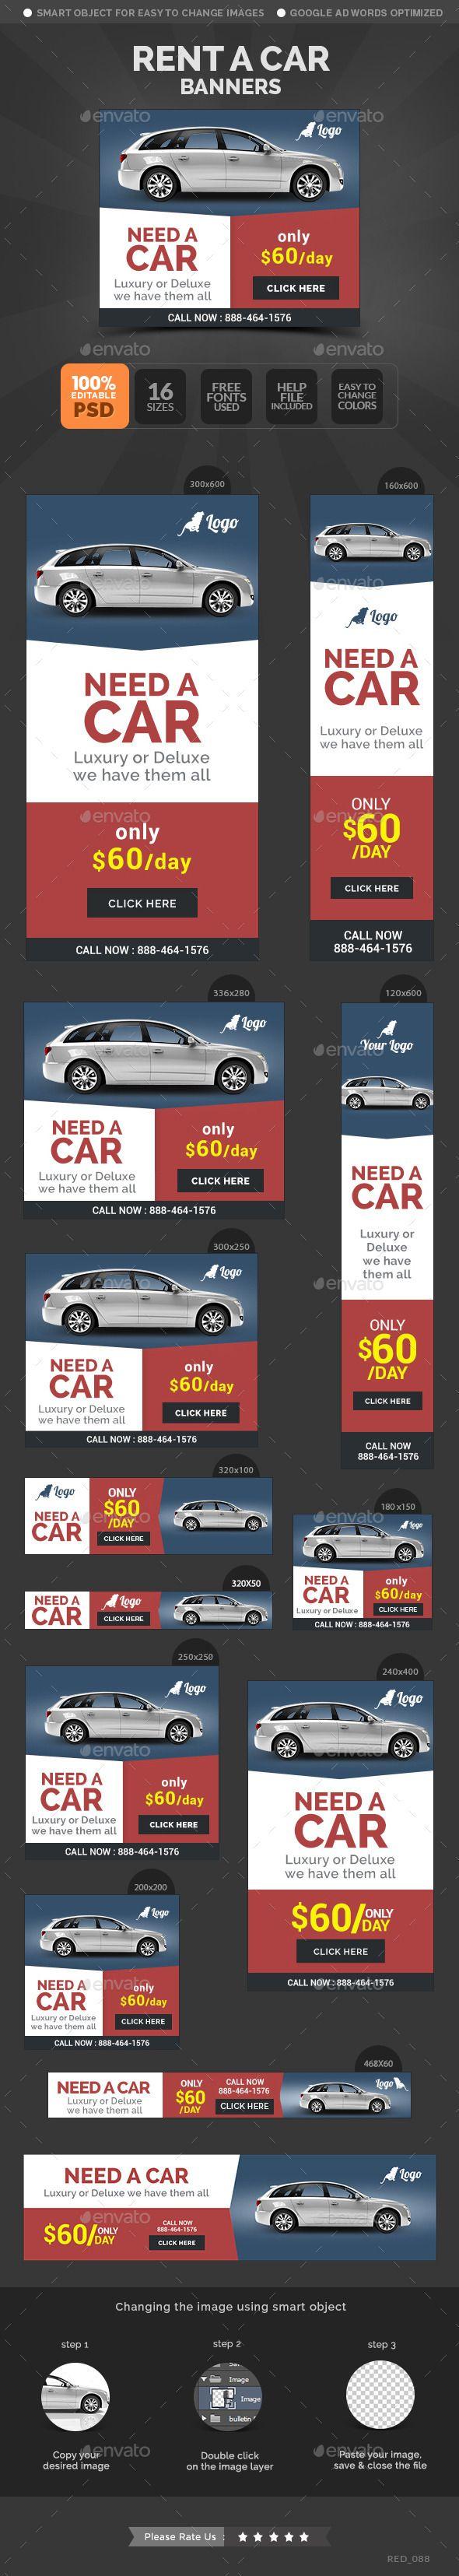 Car Rental Banners Template